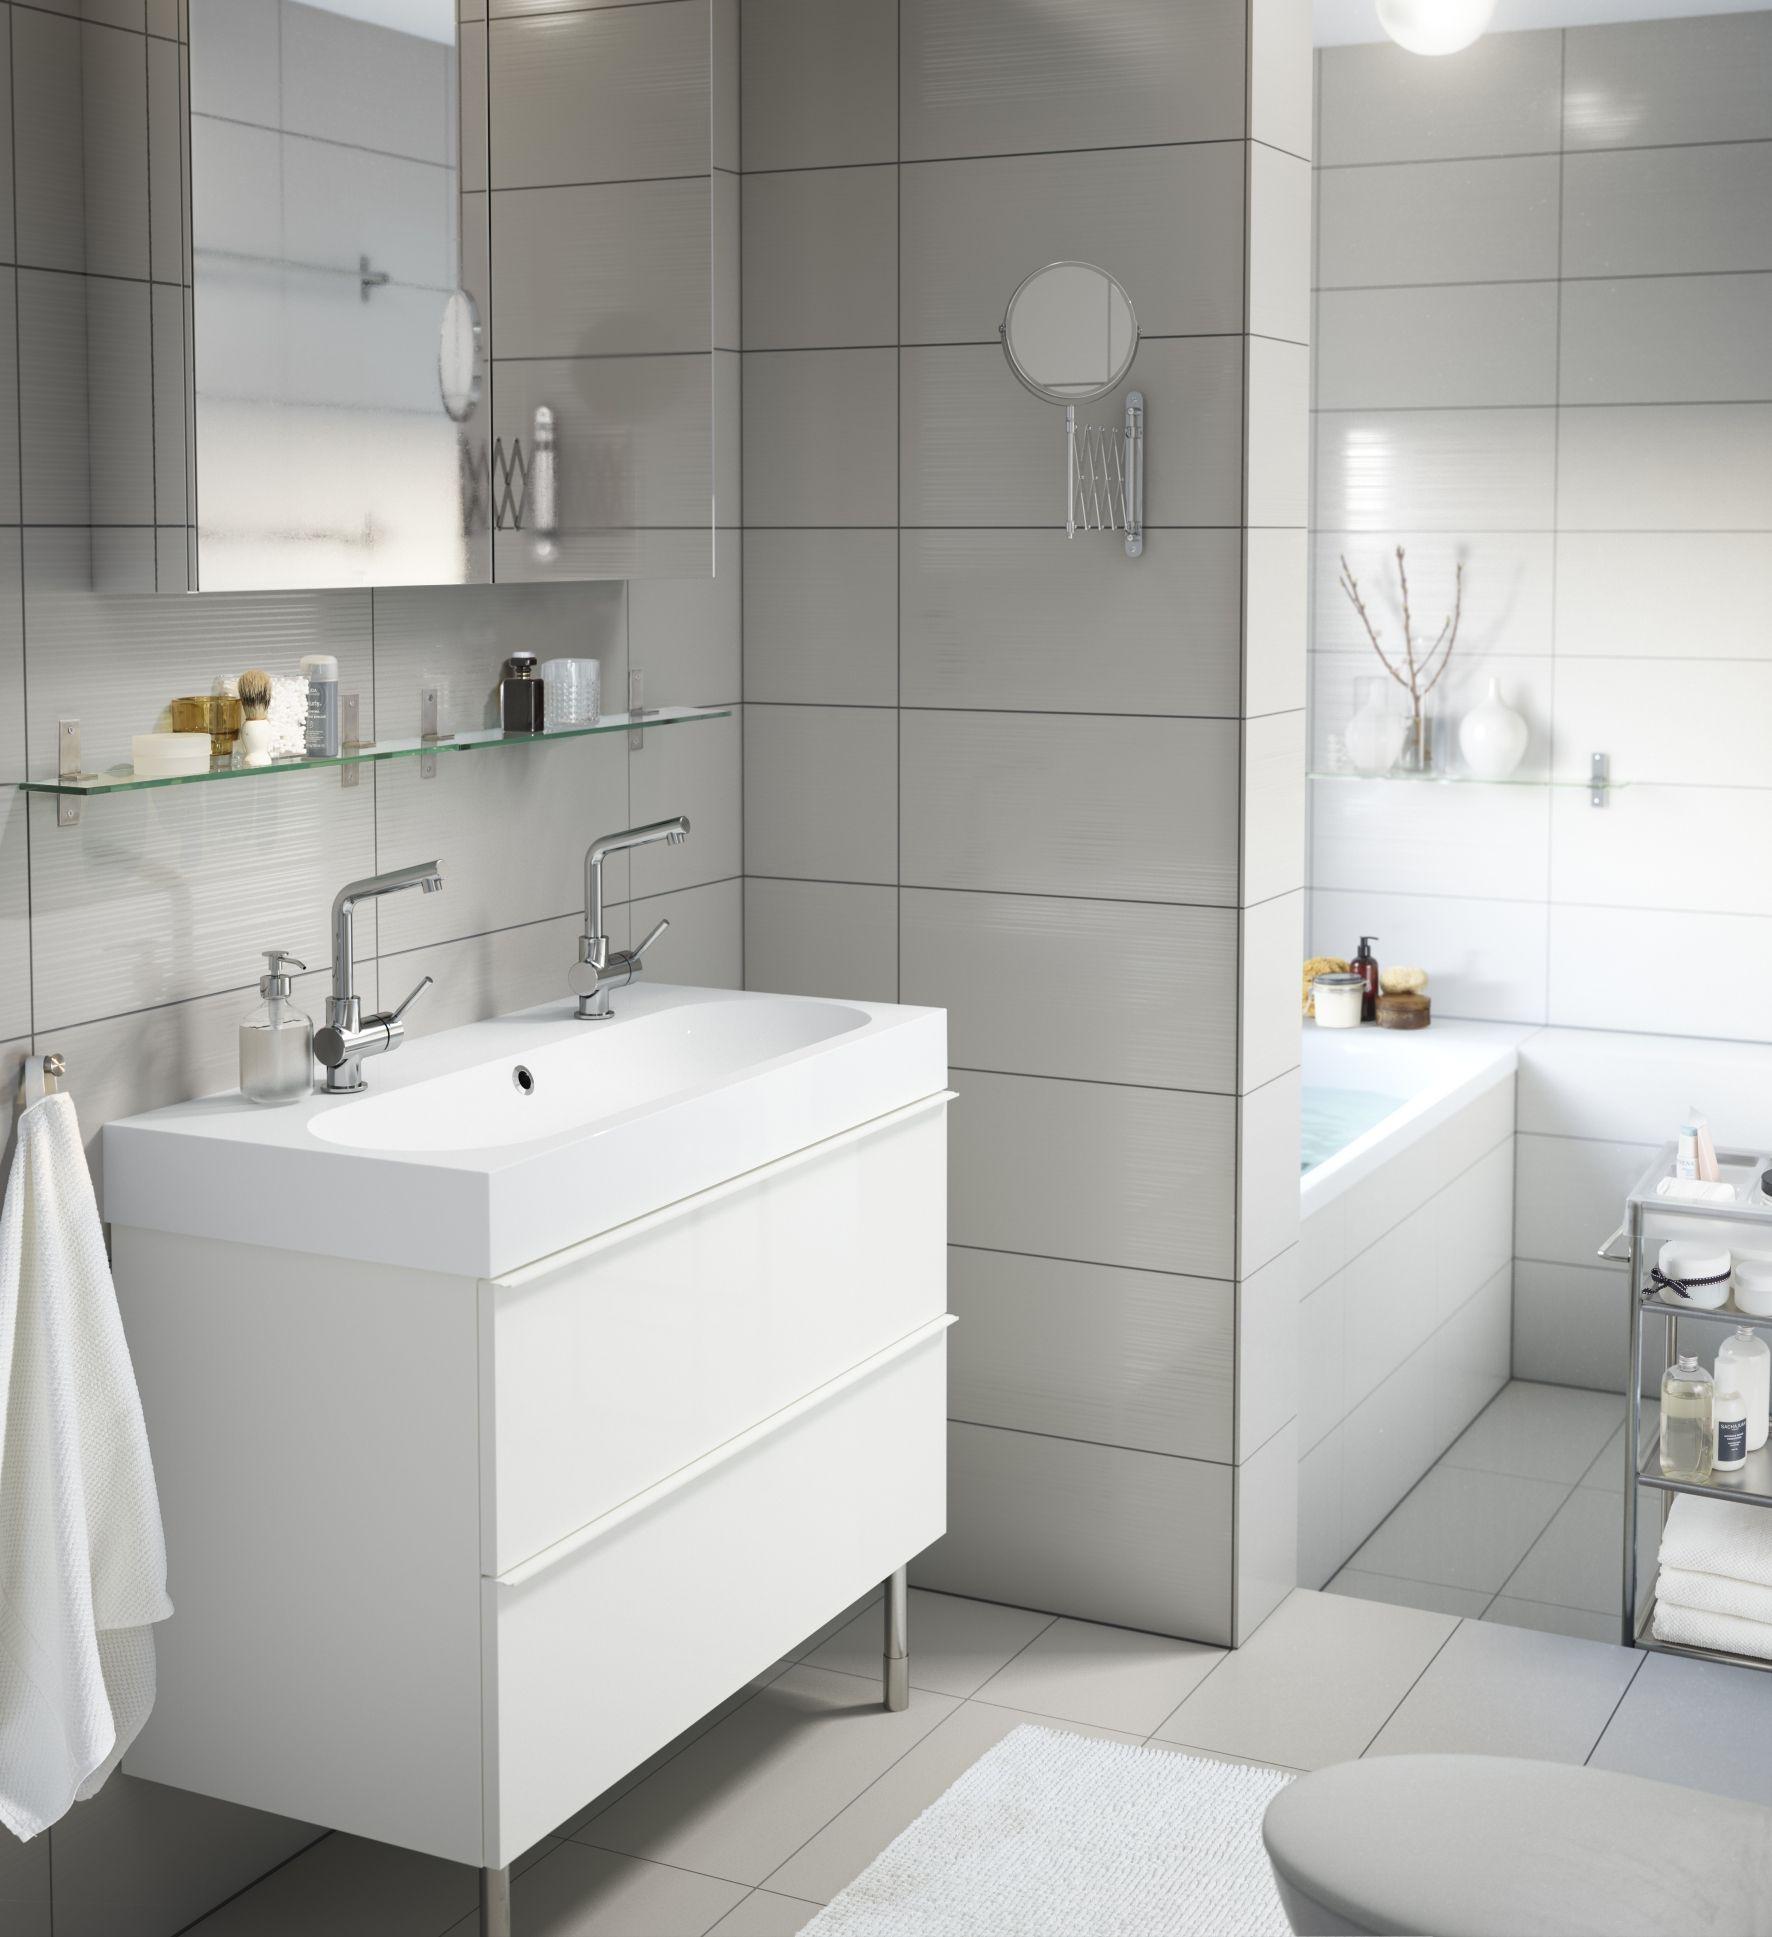 GODMORGON wastafelkast | #IKEA #badkamer #opberger | Decoración ...